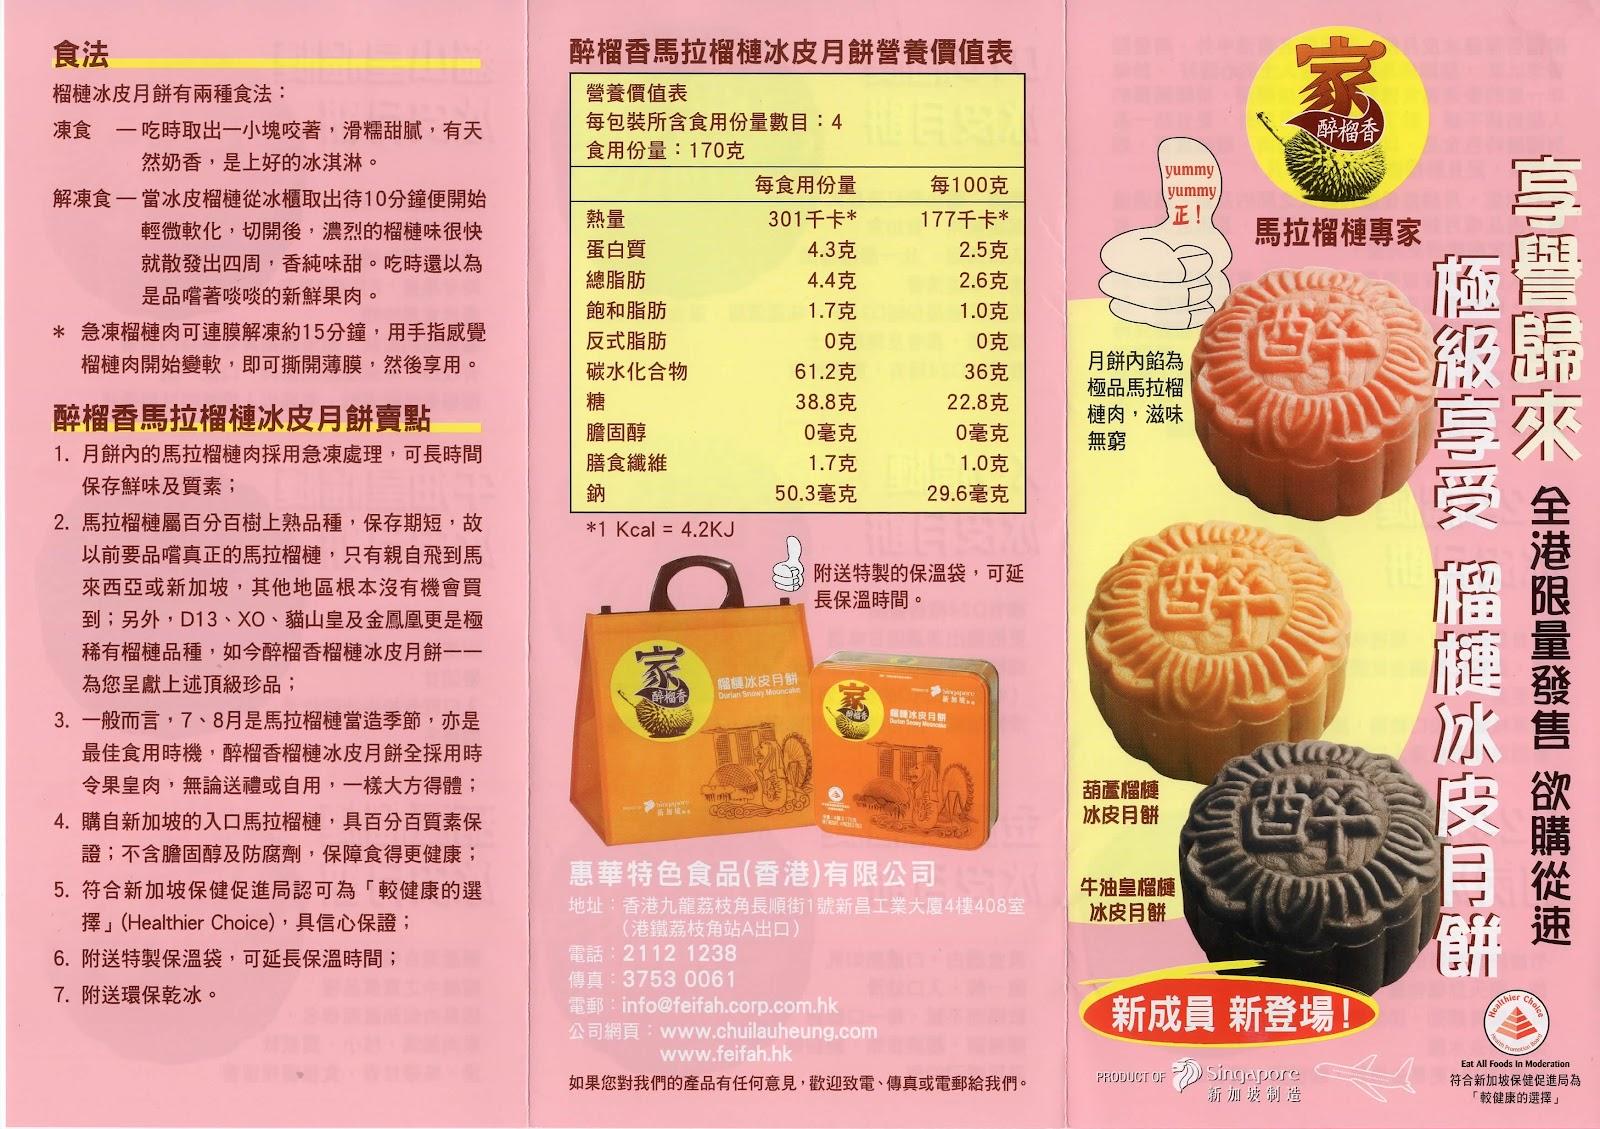 香港中秋月餅 Hong Kong Moon Cake: 2012 榴槤月餅